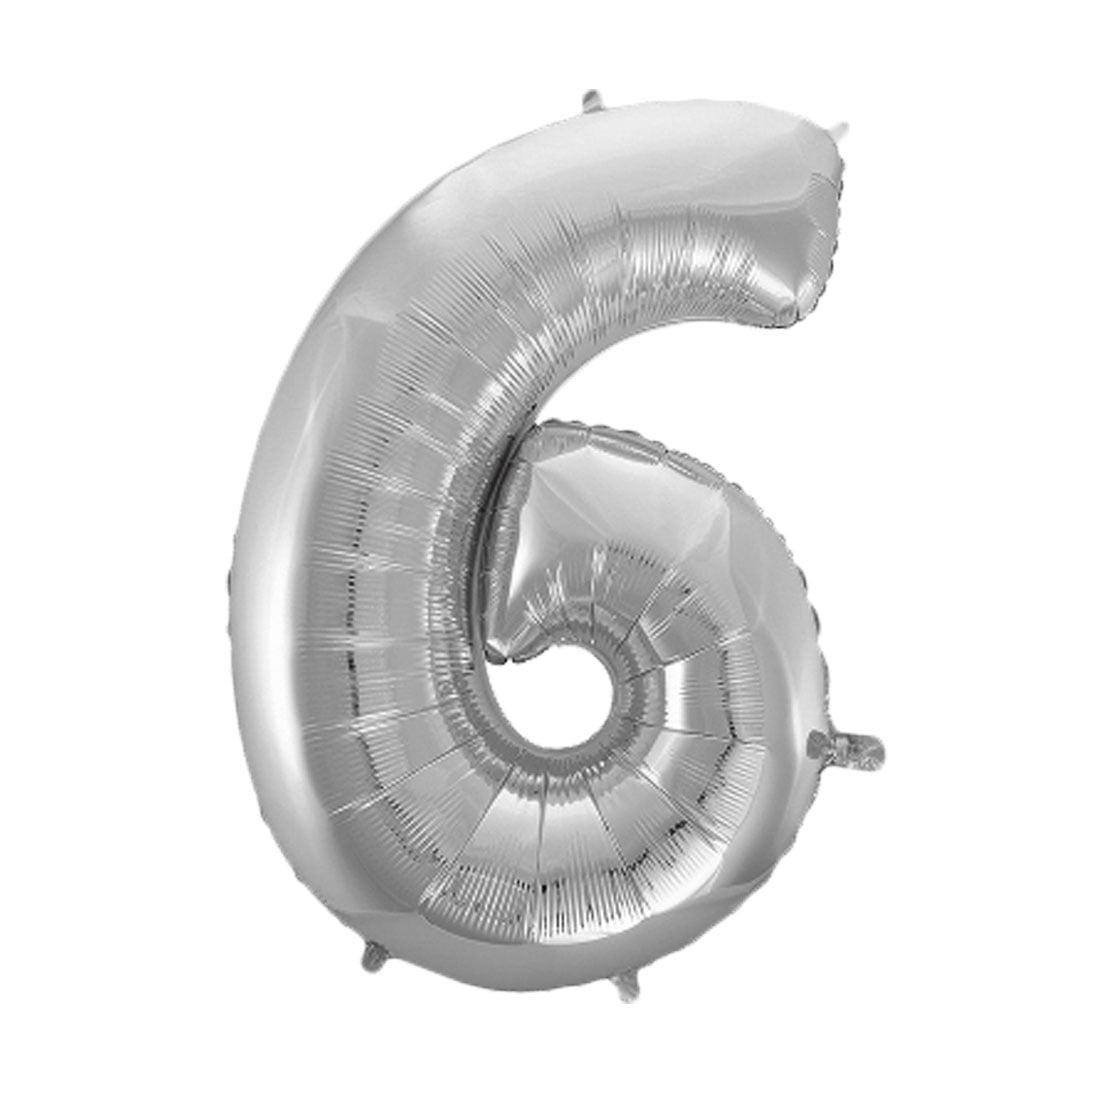 "Unique Bargains Foil Number 6 Shape Helium Balloon Birthday Wedding Decor Silver Tone 30"""